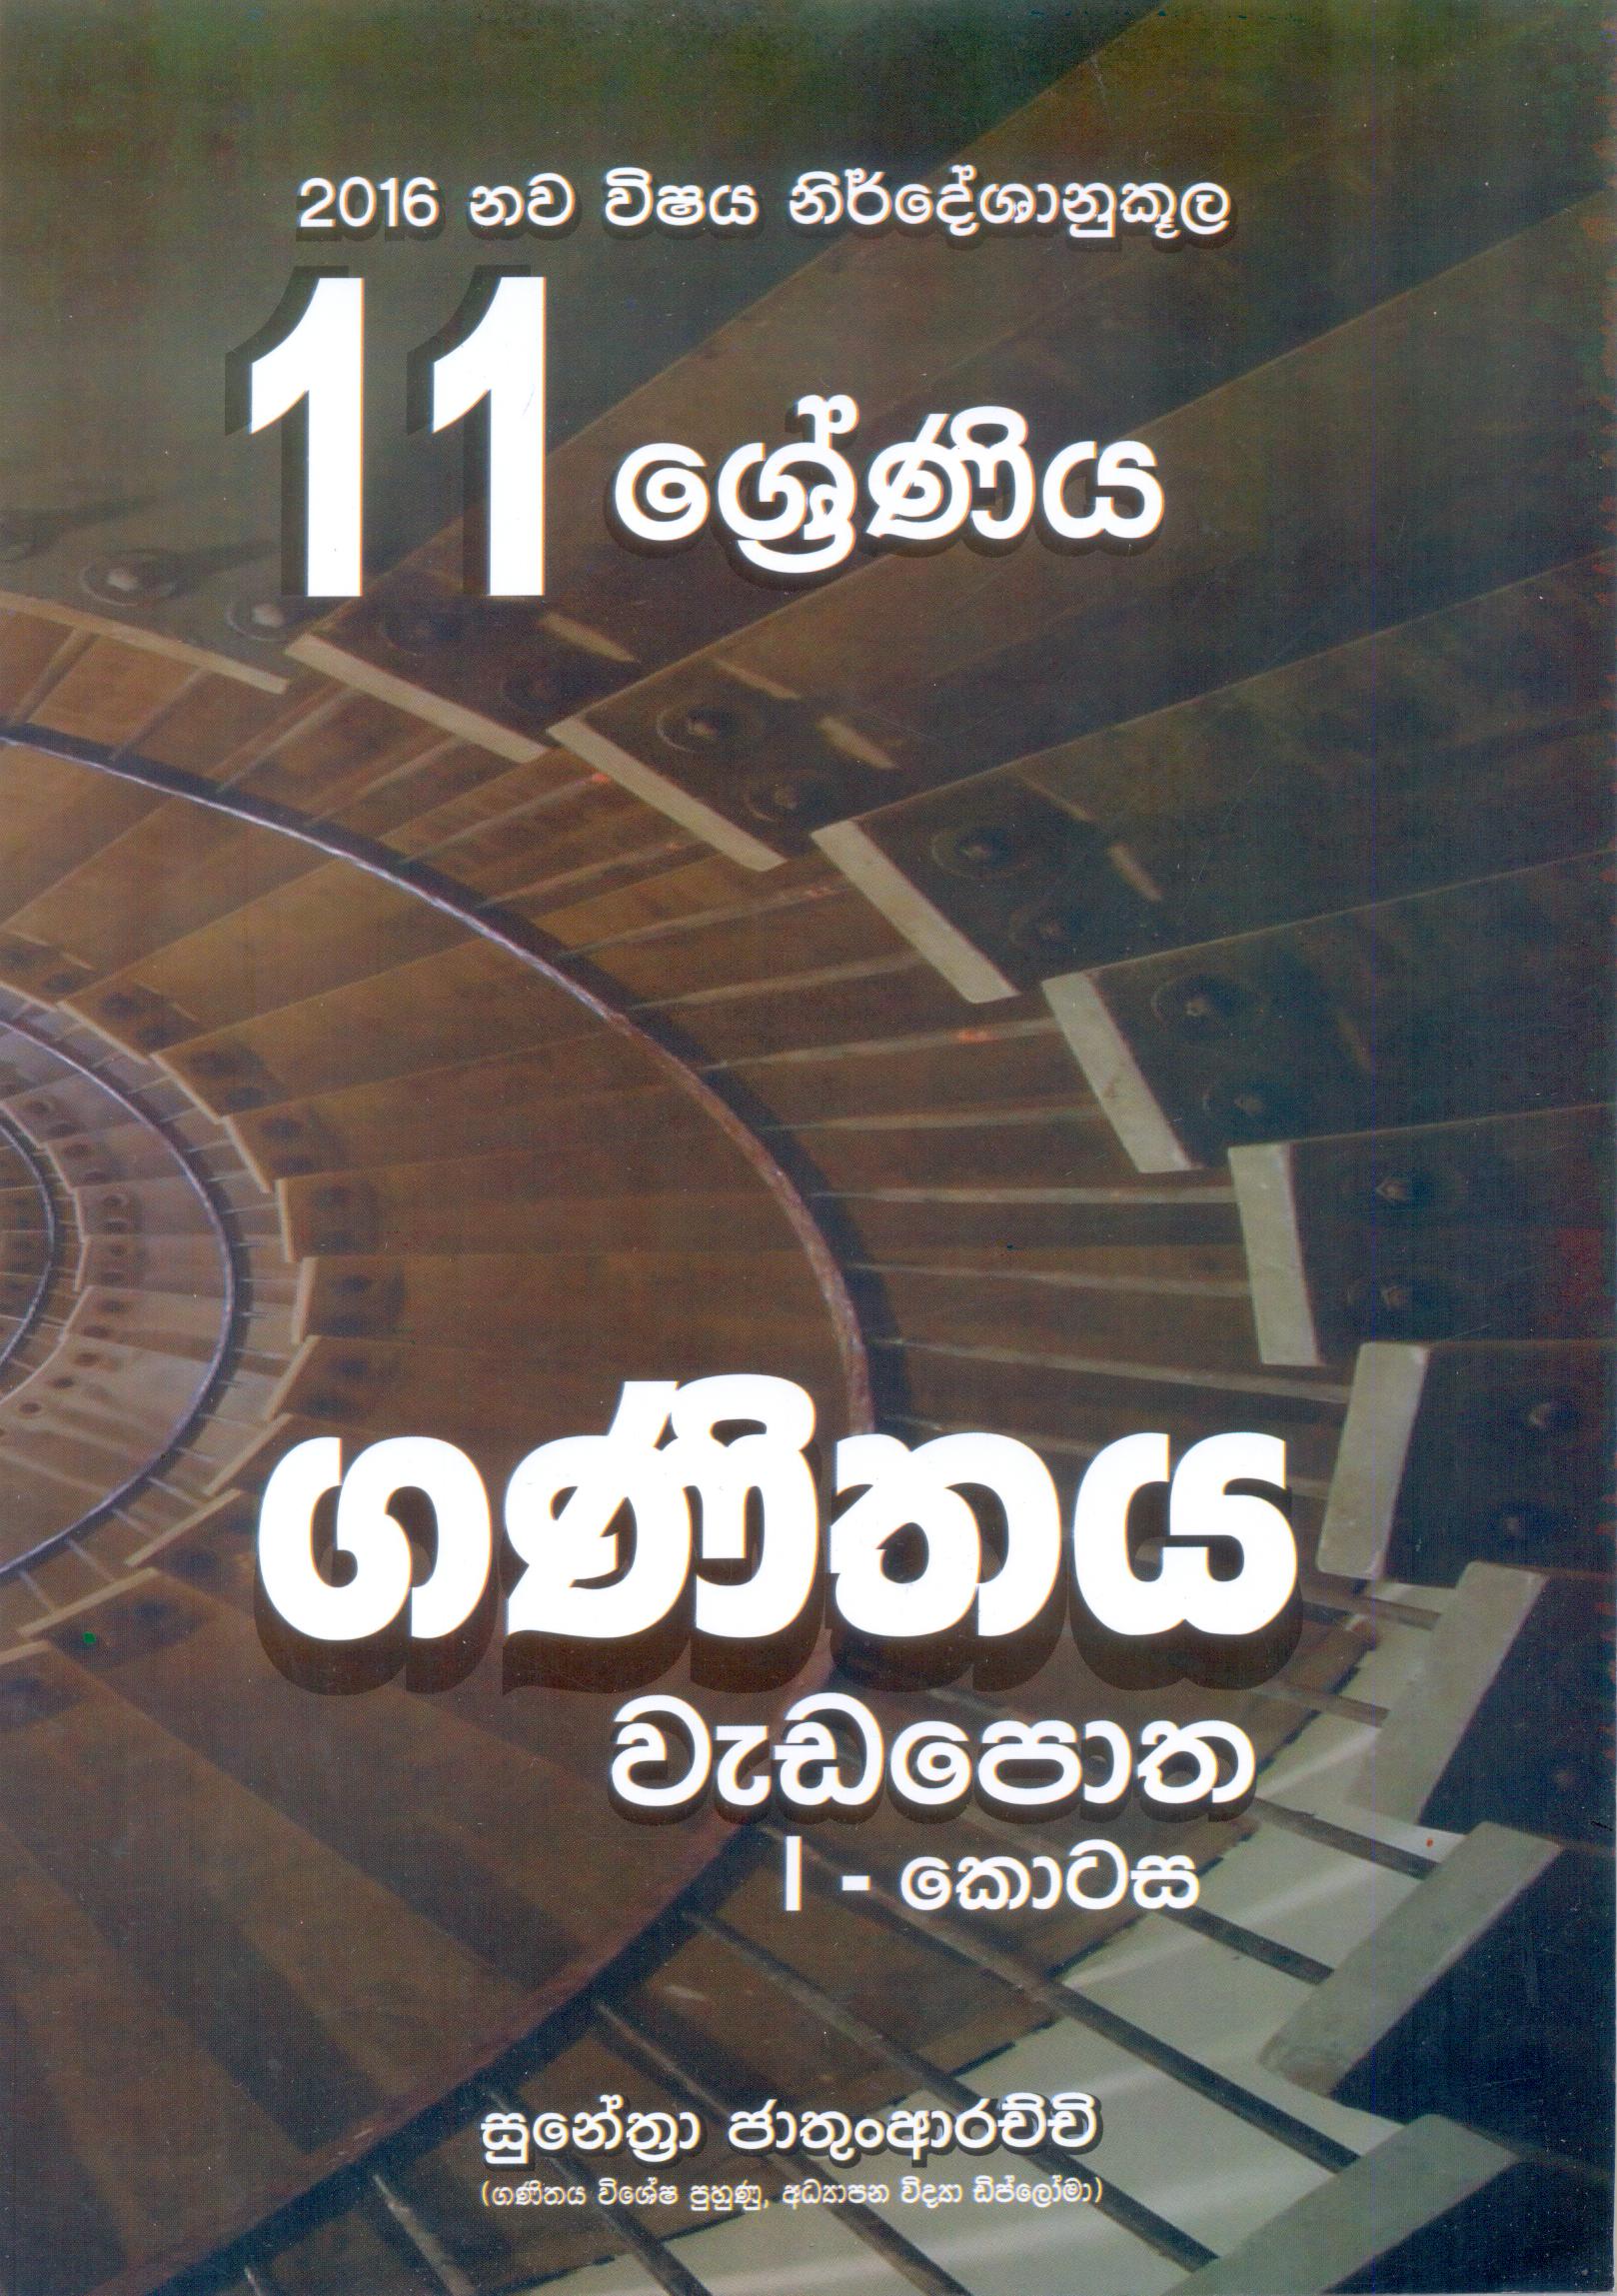 2016 Nawa Vishaya Nirdeshanukoola 11 Shreniya Ganithaya Wadapotha : I - Kotasa